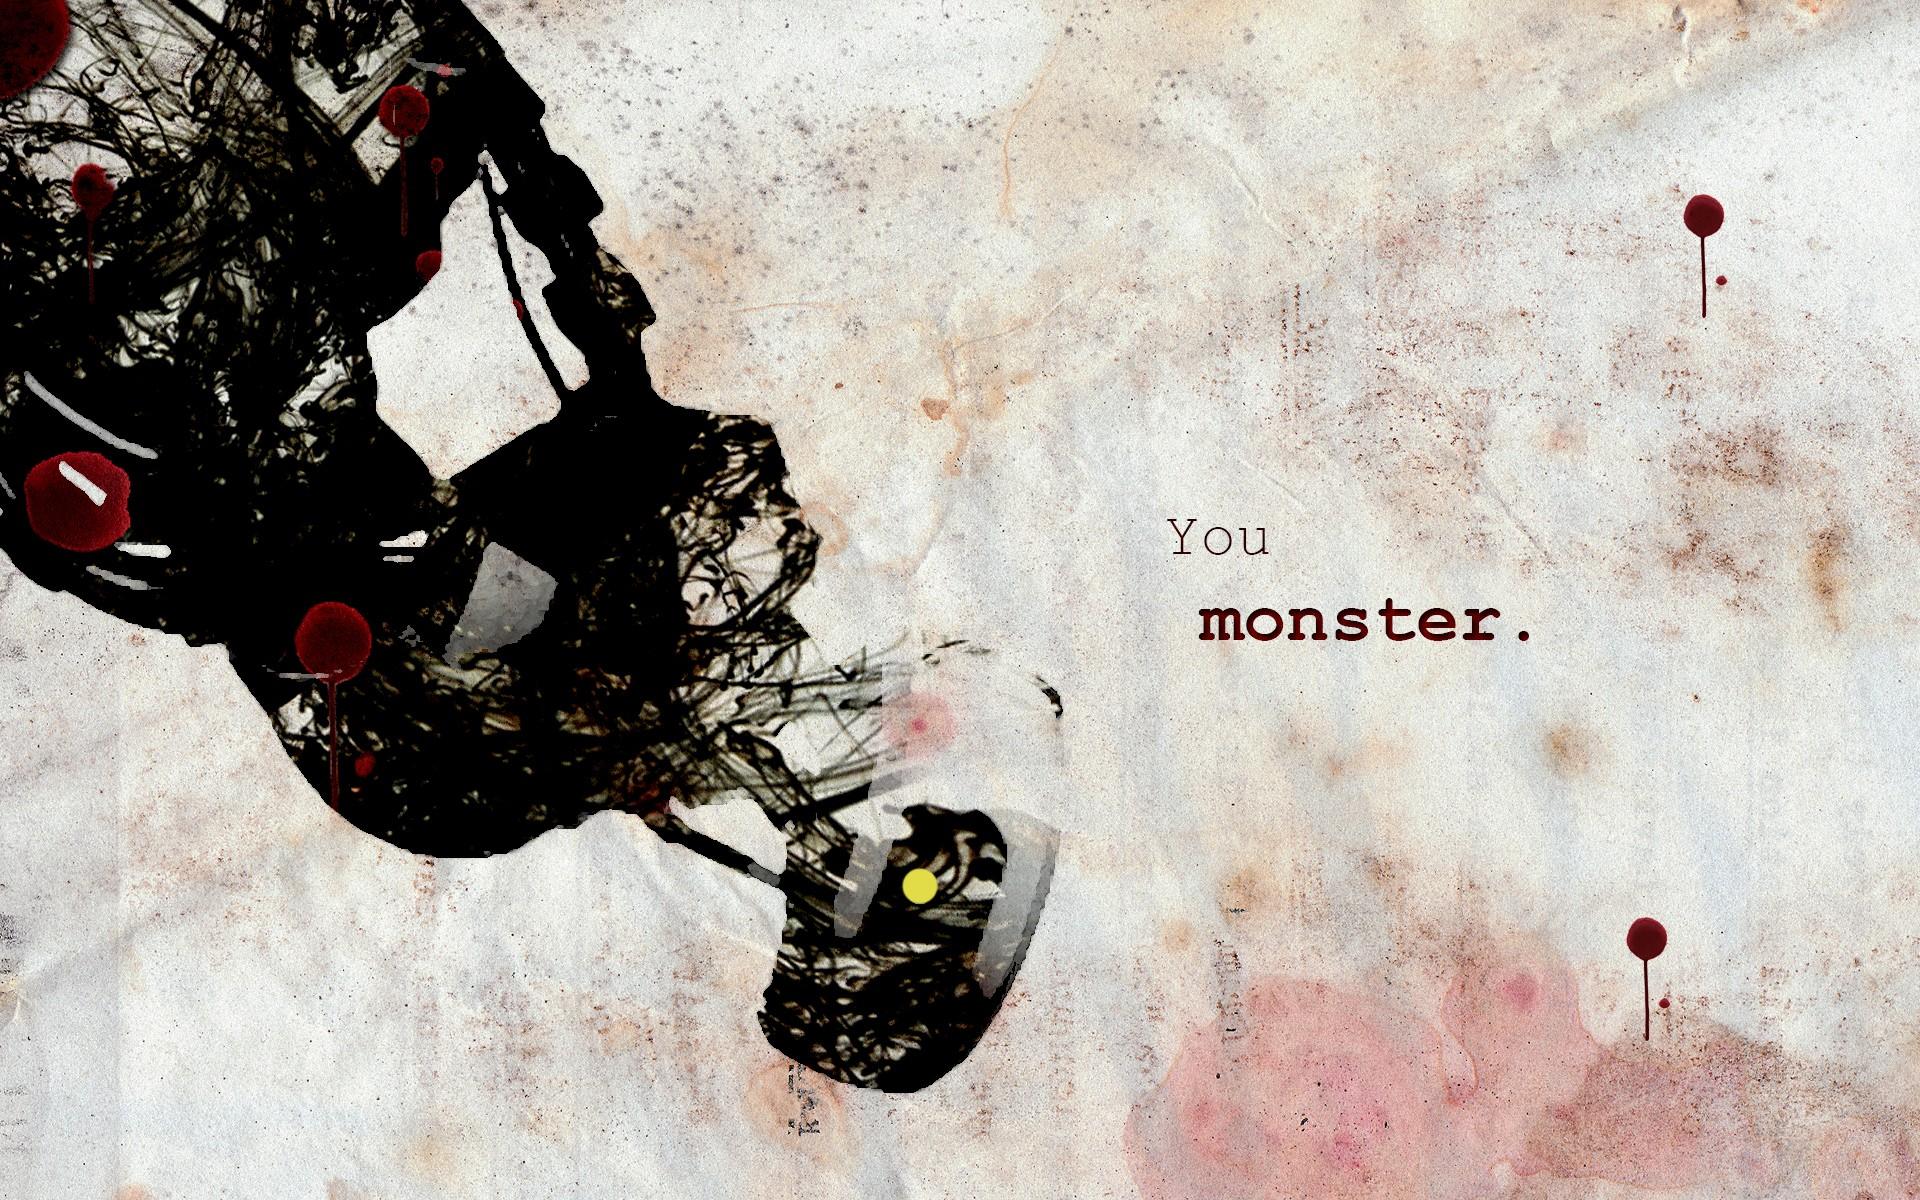 You-monster-portal-2-30650838-1920-1200.